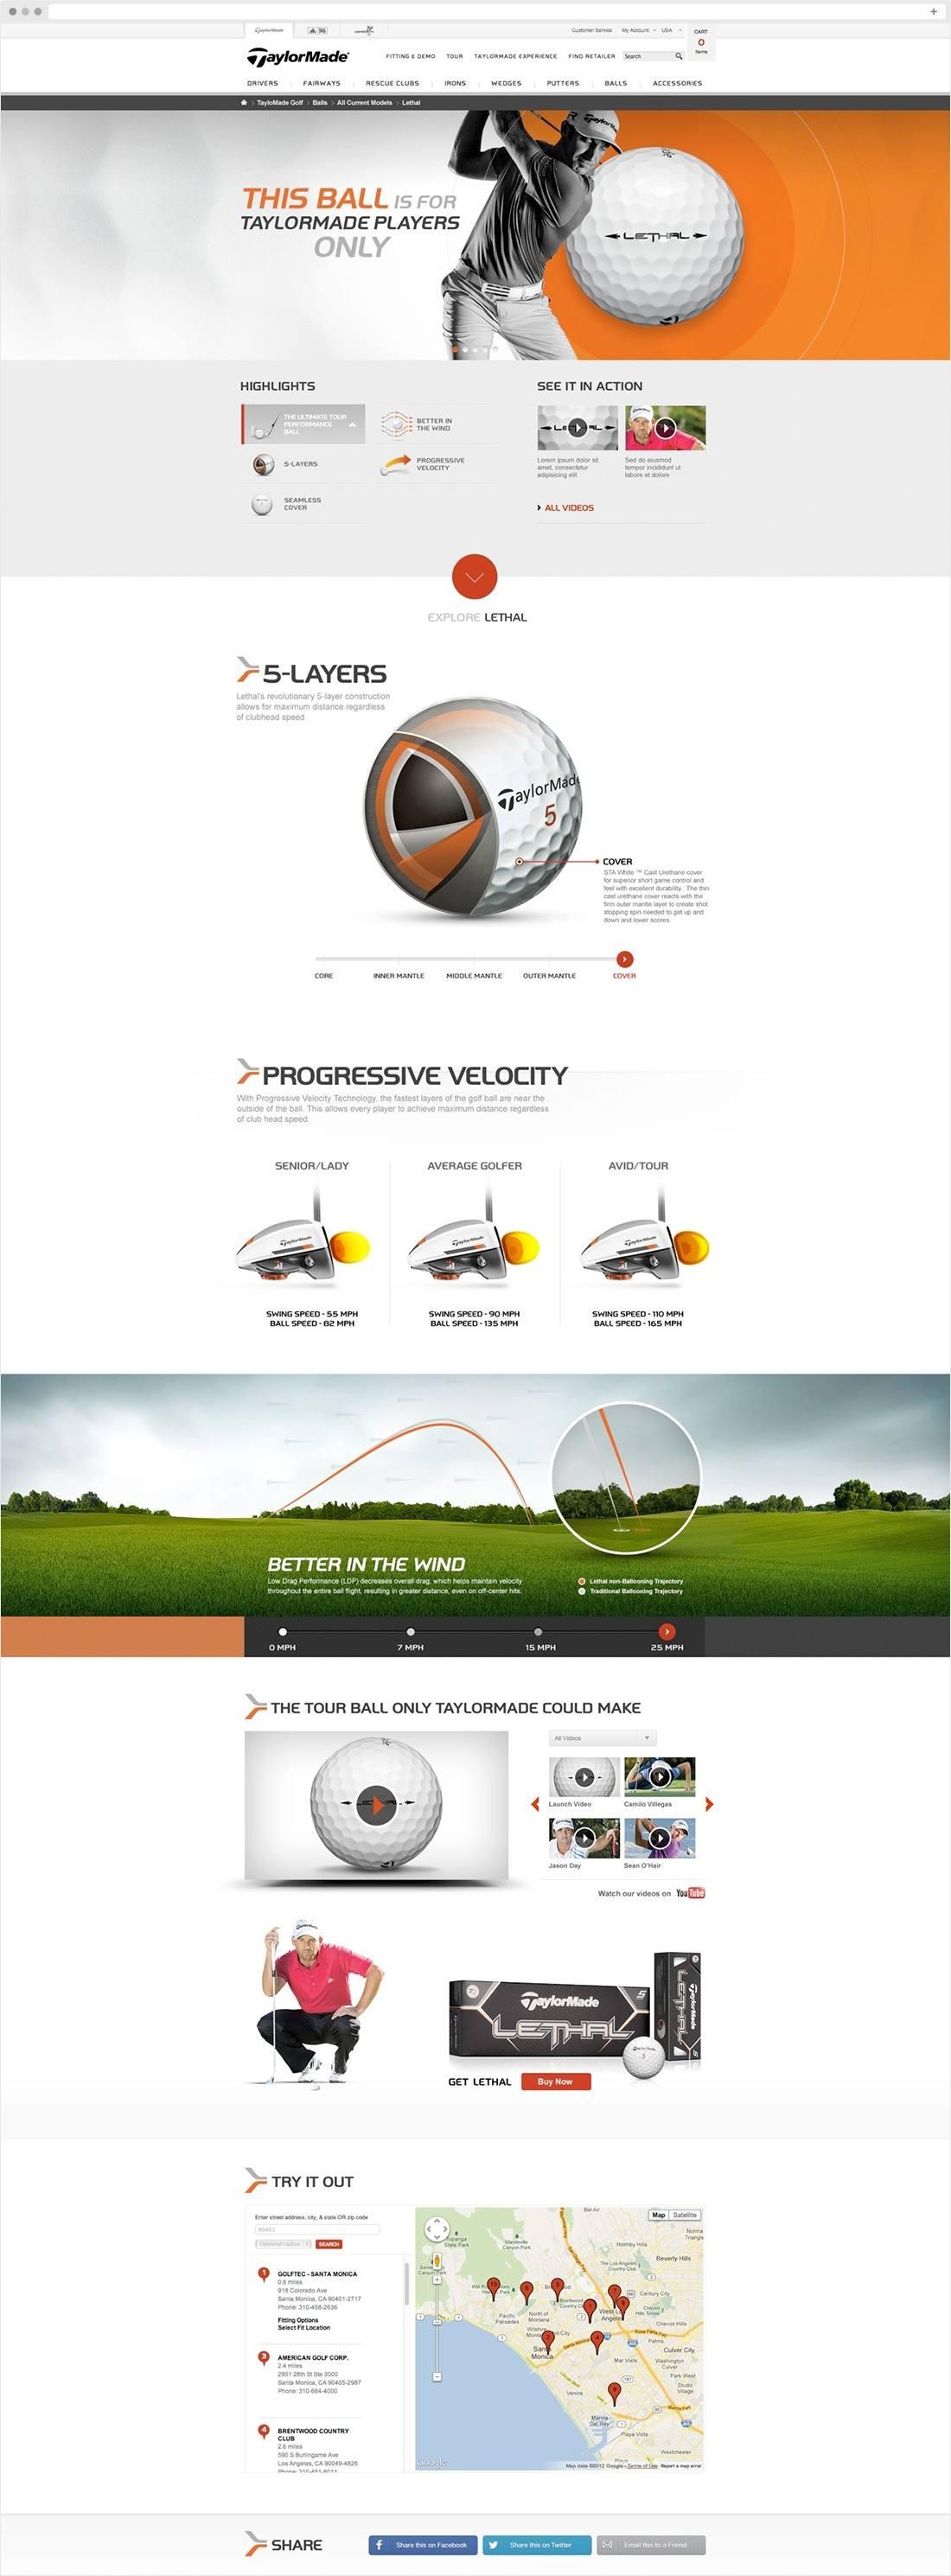 ampagency_work_taylormade_desktop_image03